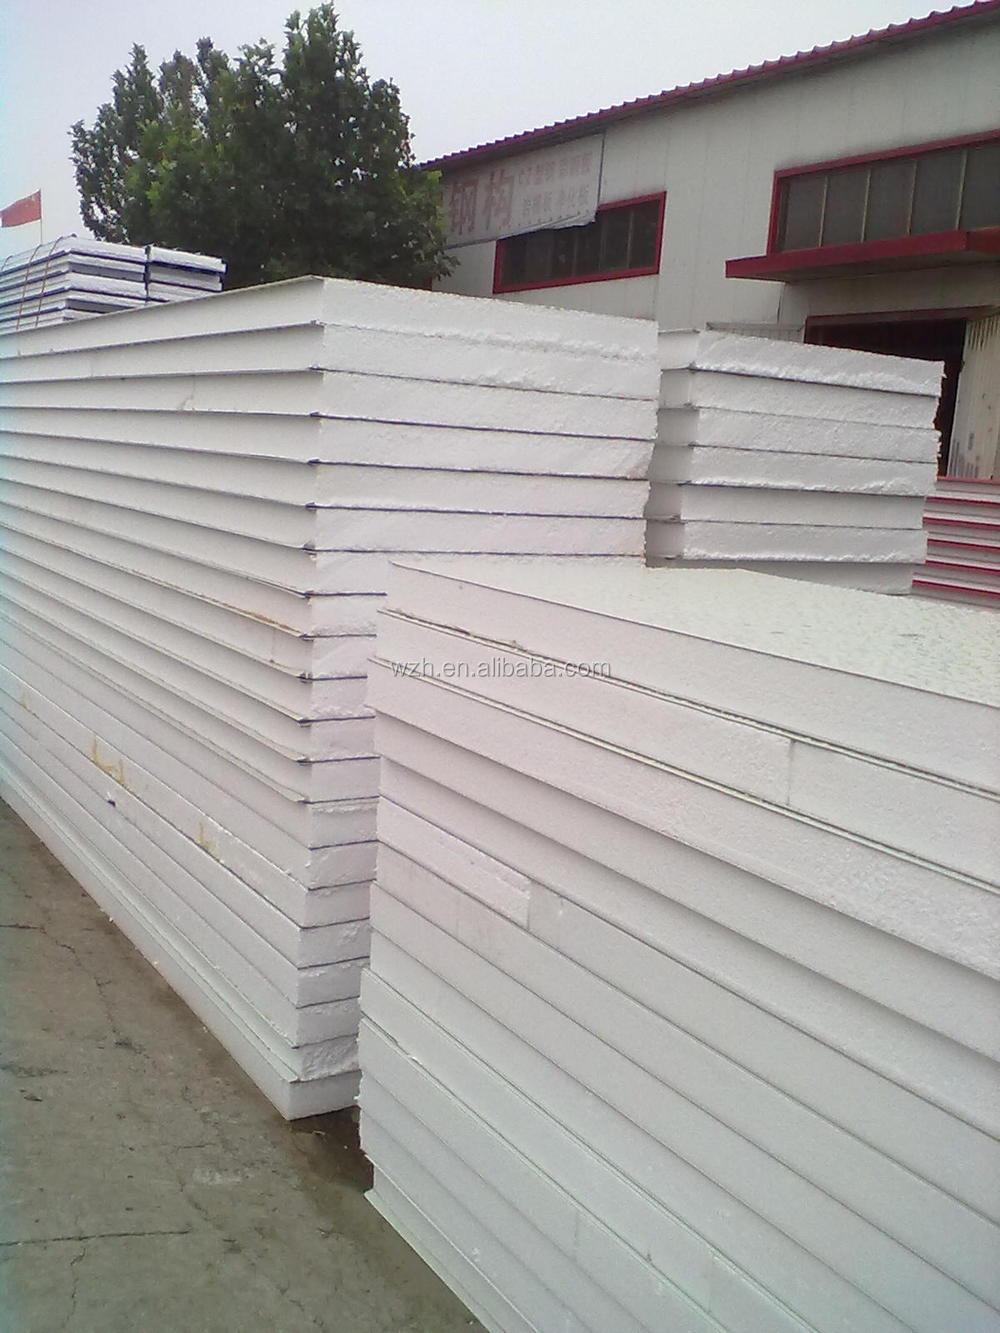 Fire Proof Rockwool Insulation Metal Roof Panels Buy